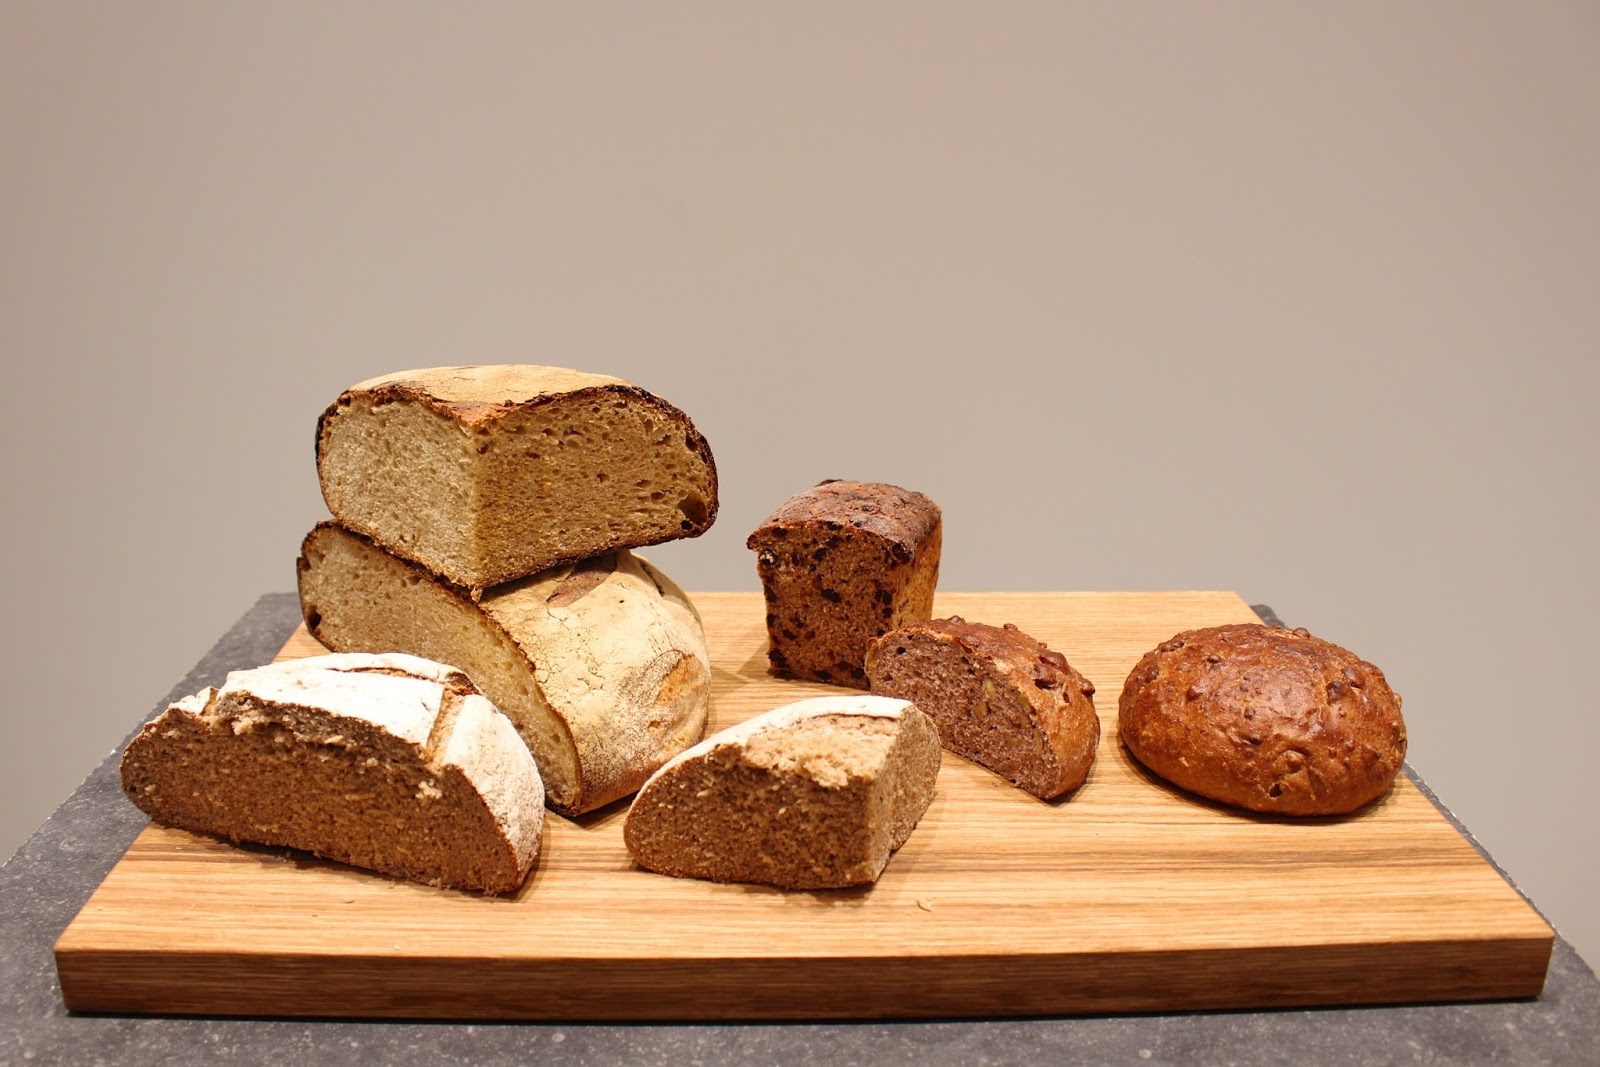 Poilâne Bakery - Bakkerij Wijnegem Antwerp Kanaal